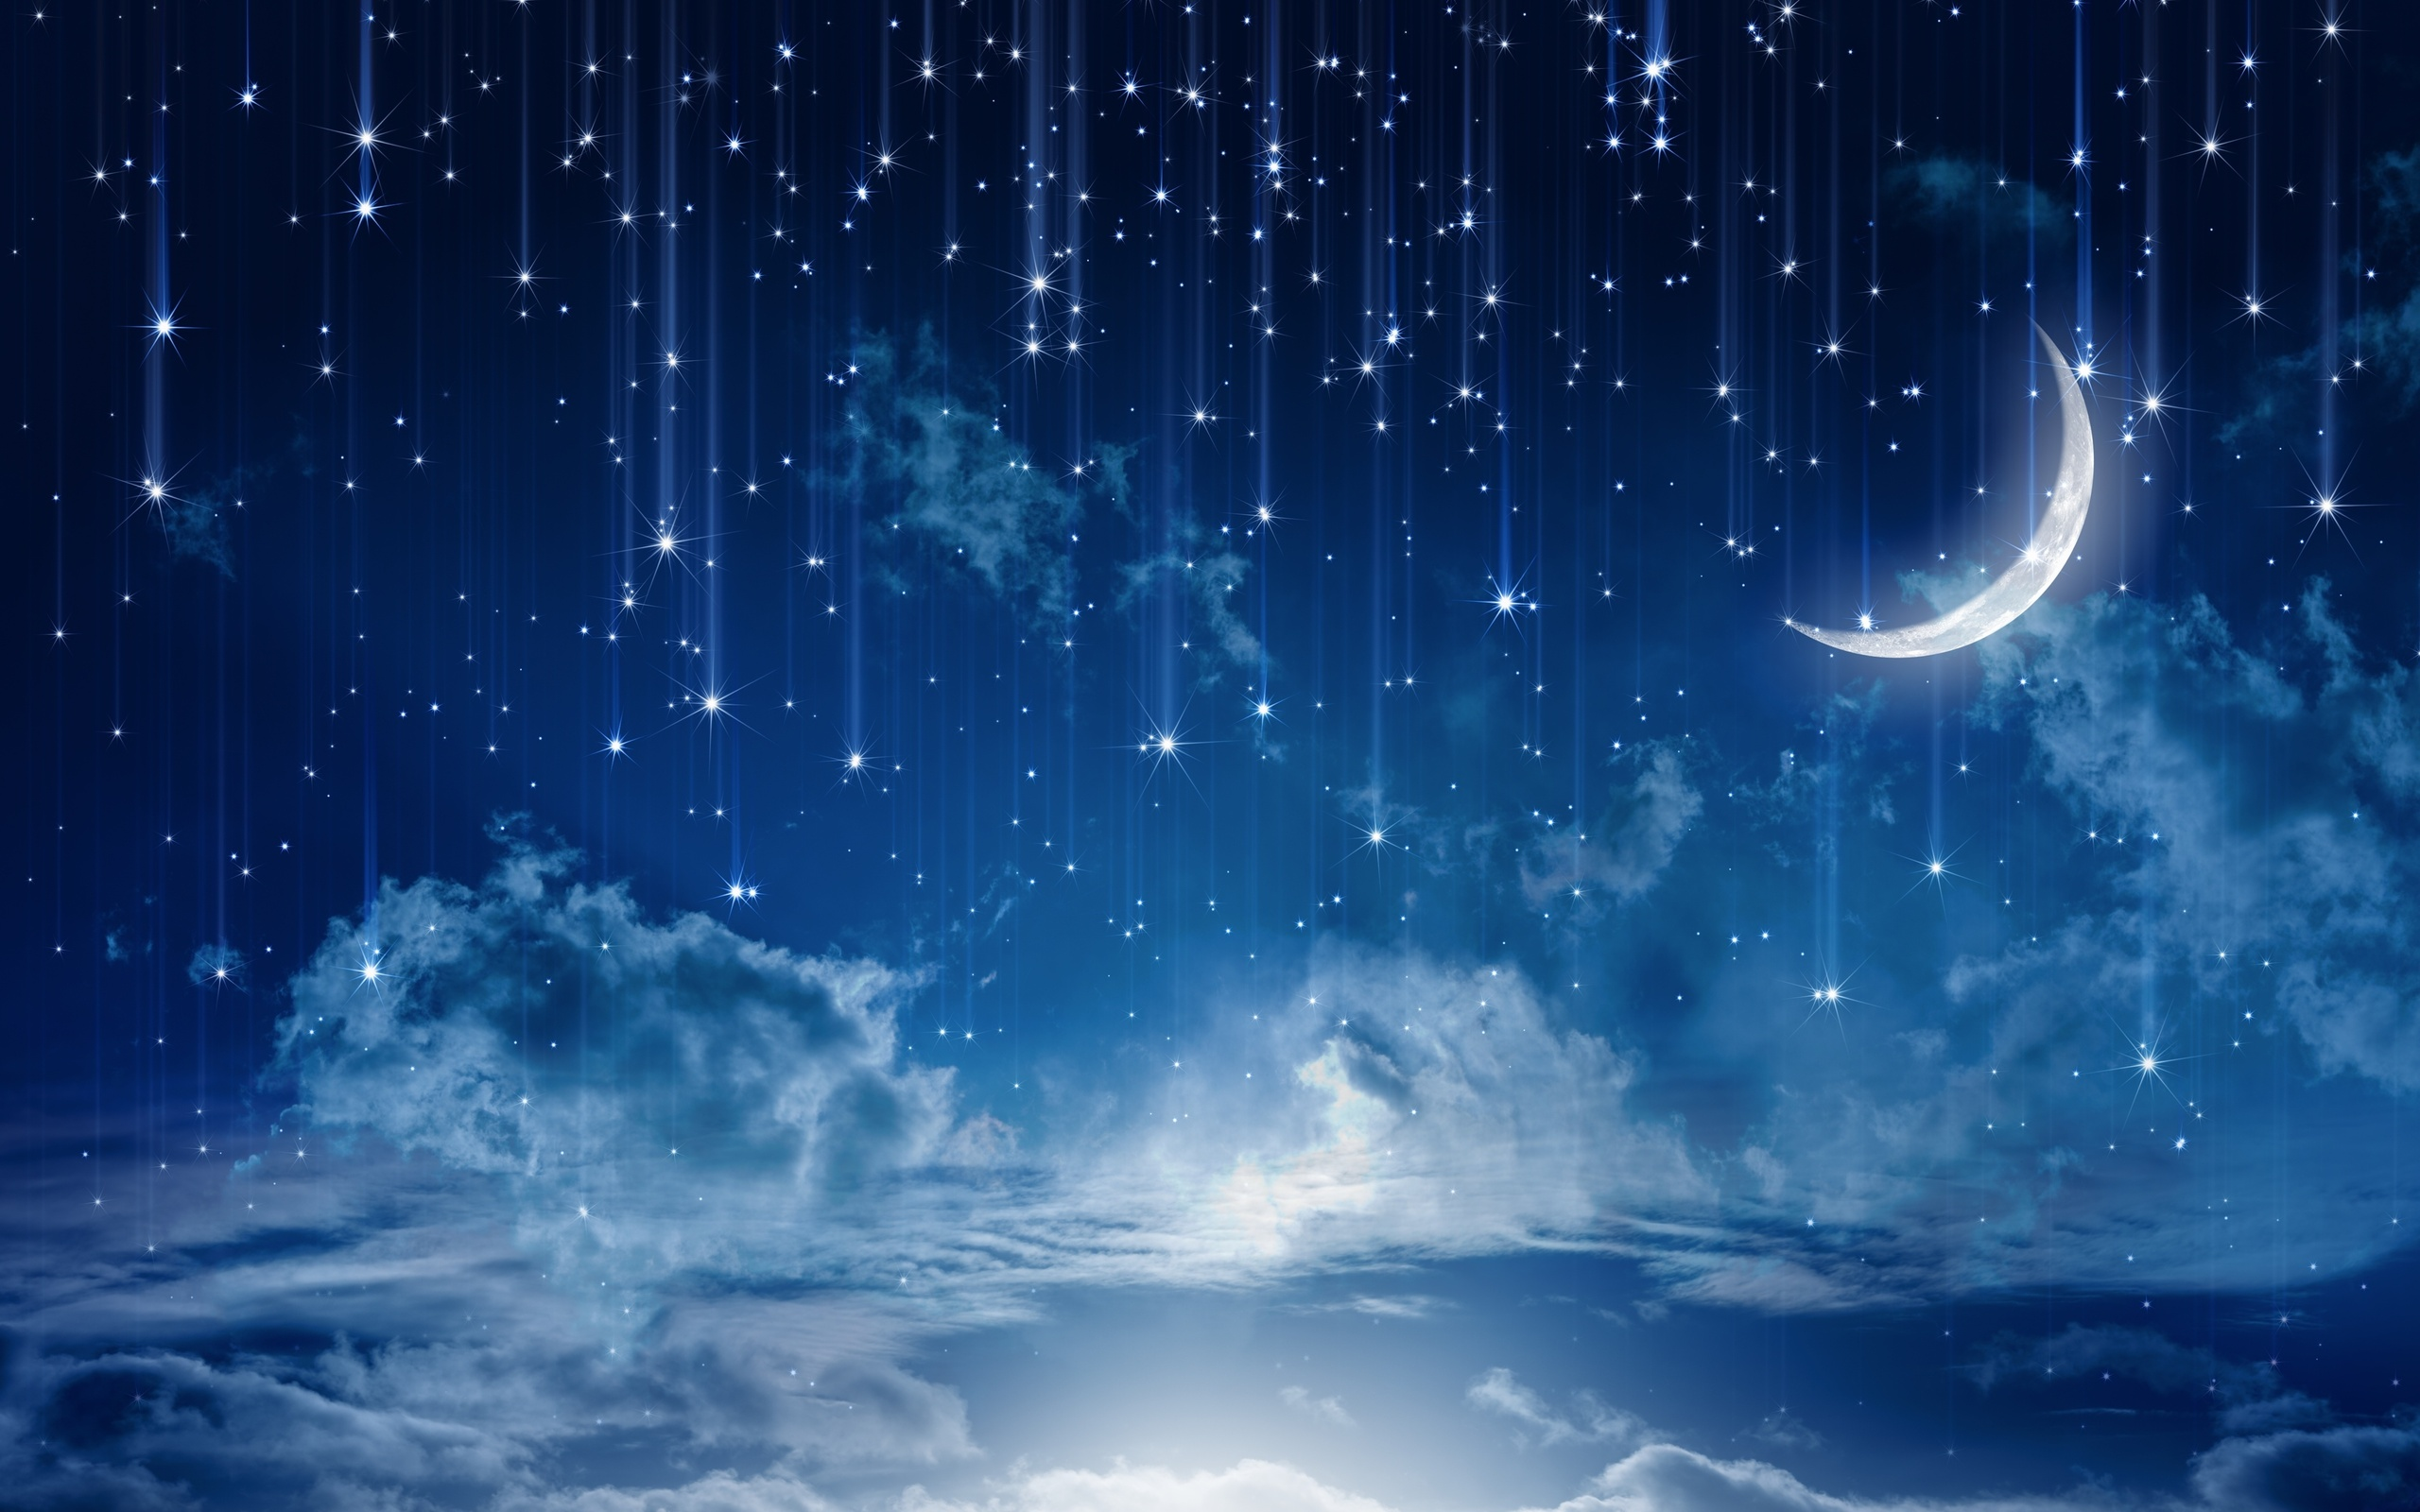 sky moonlight nature night stars clouds rain landscape moon wallpaper ...